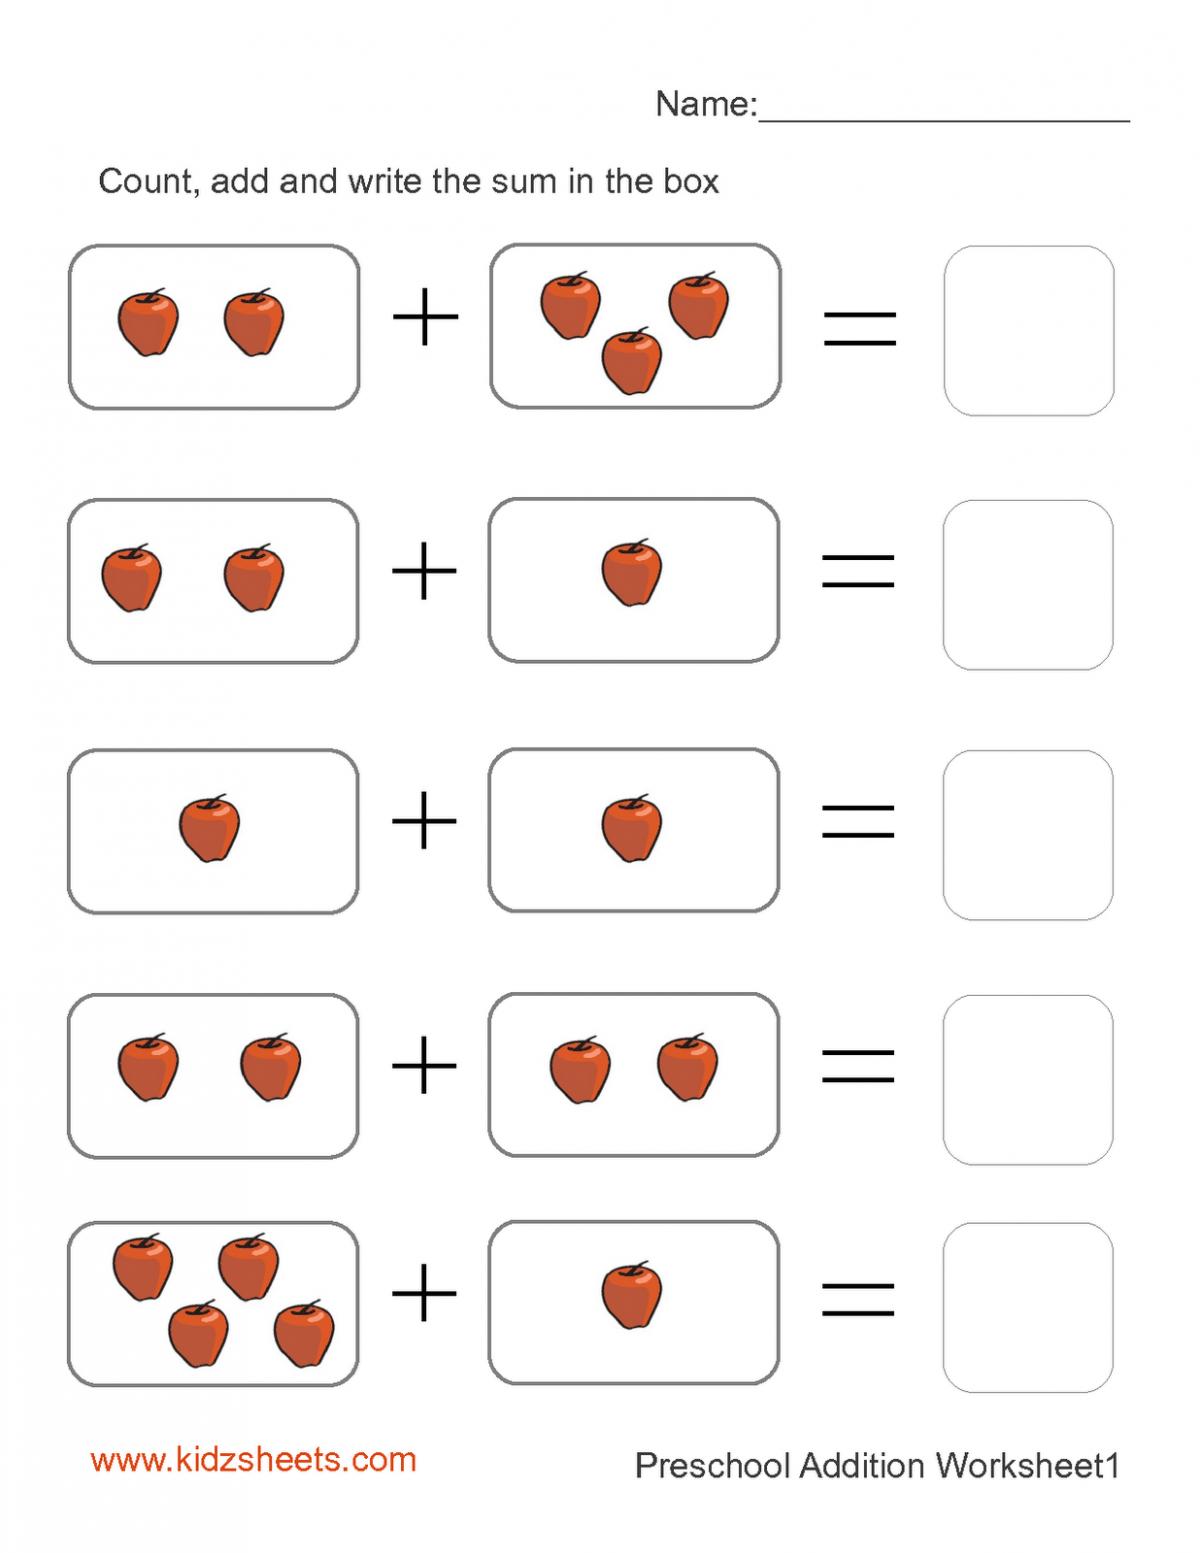 Kidz Worksheets Preschool Addition Worksheet